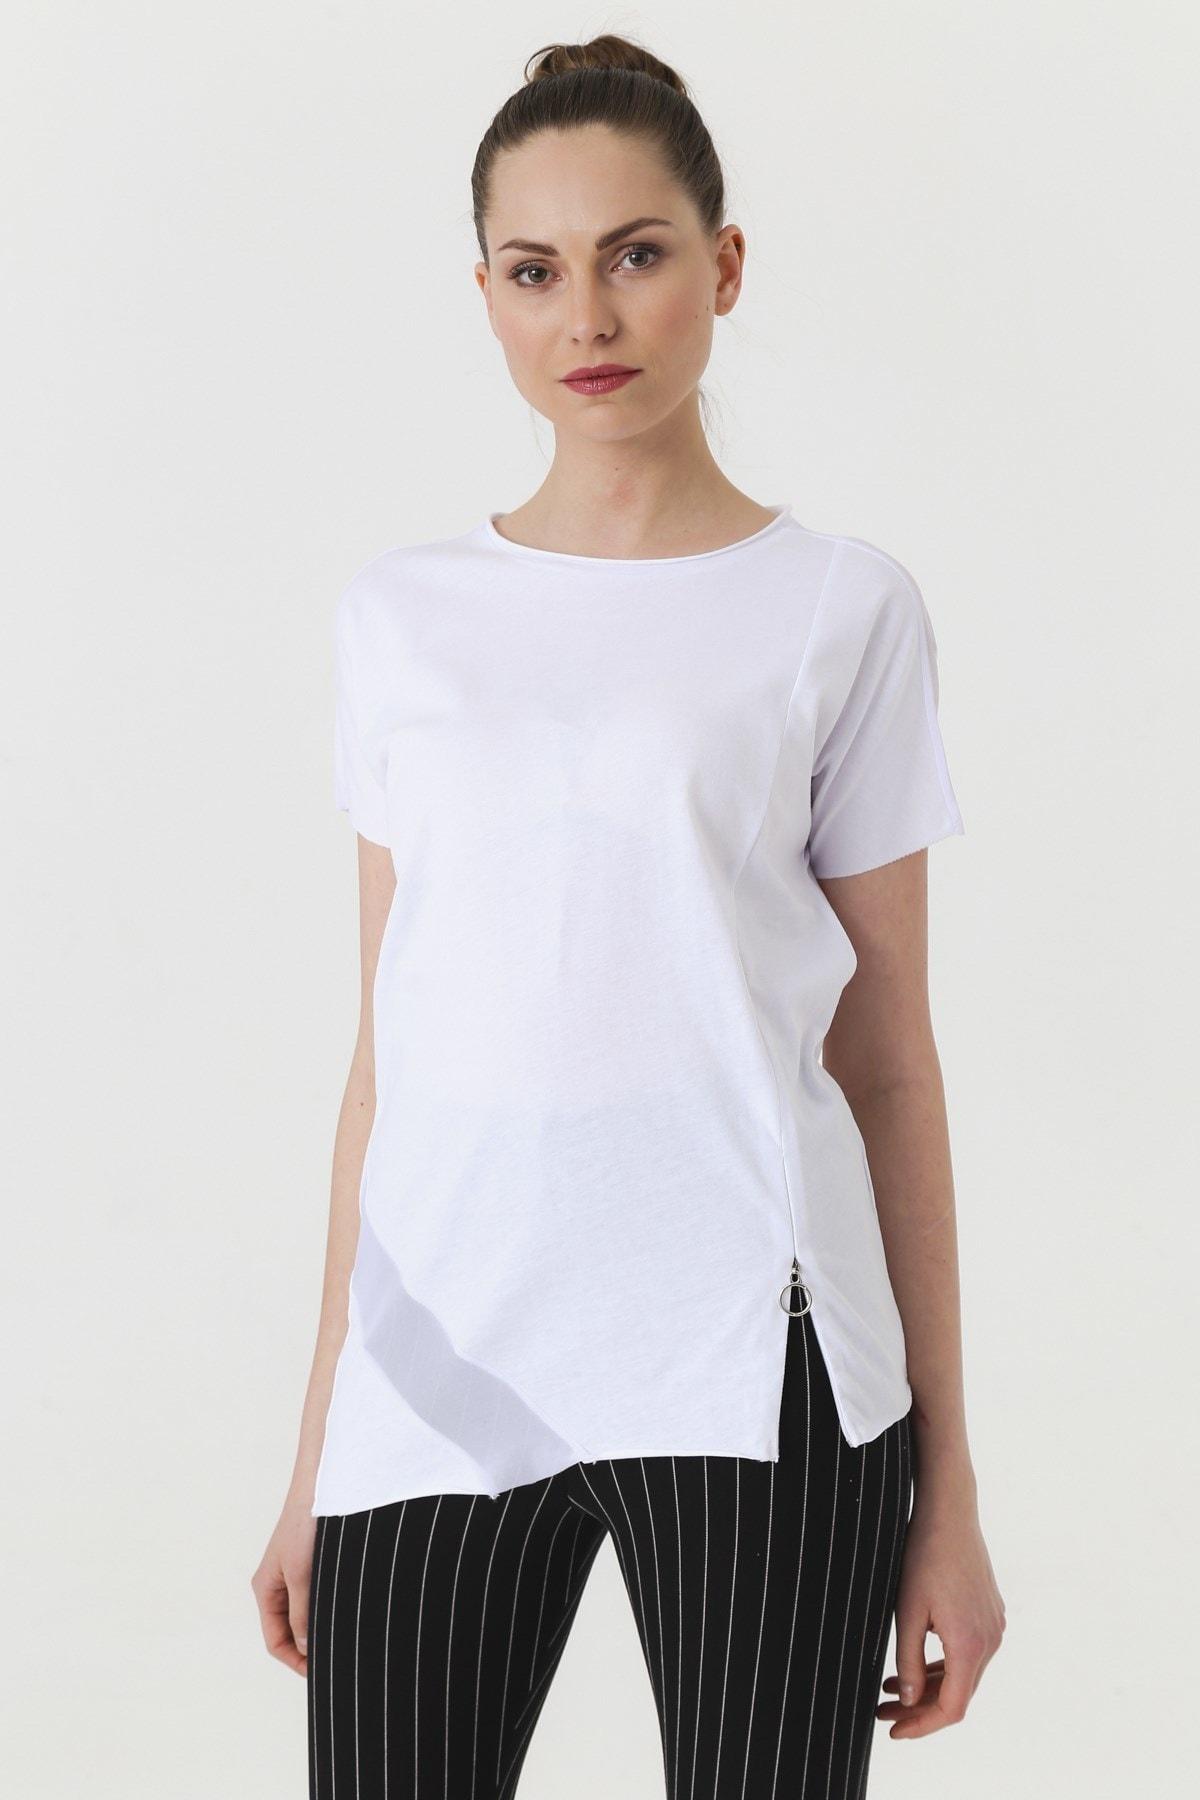 Jument Kadın Beyaz T-shirt 7095 3